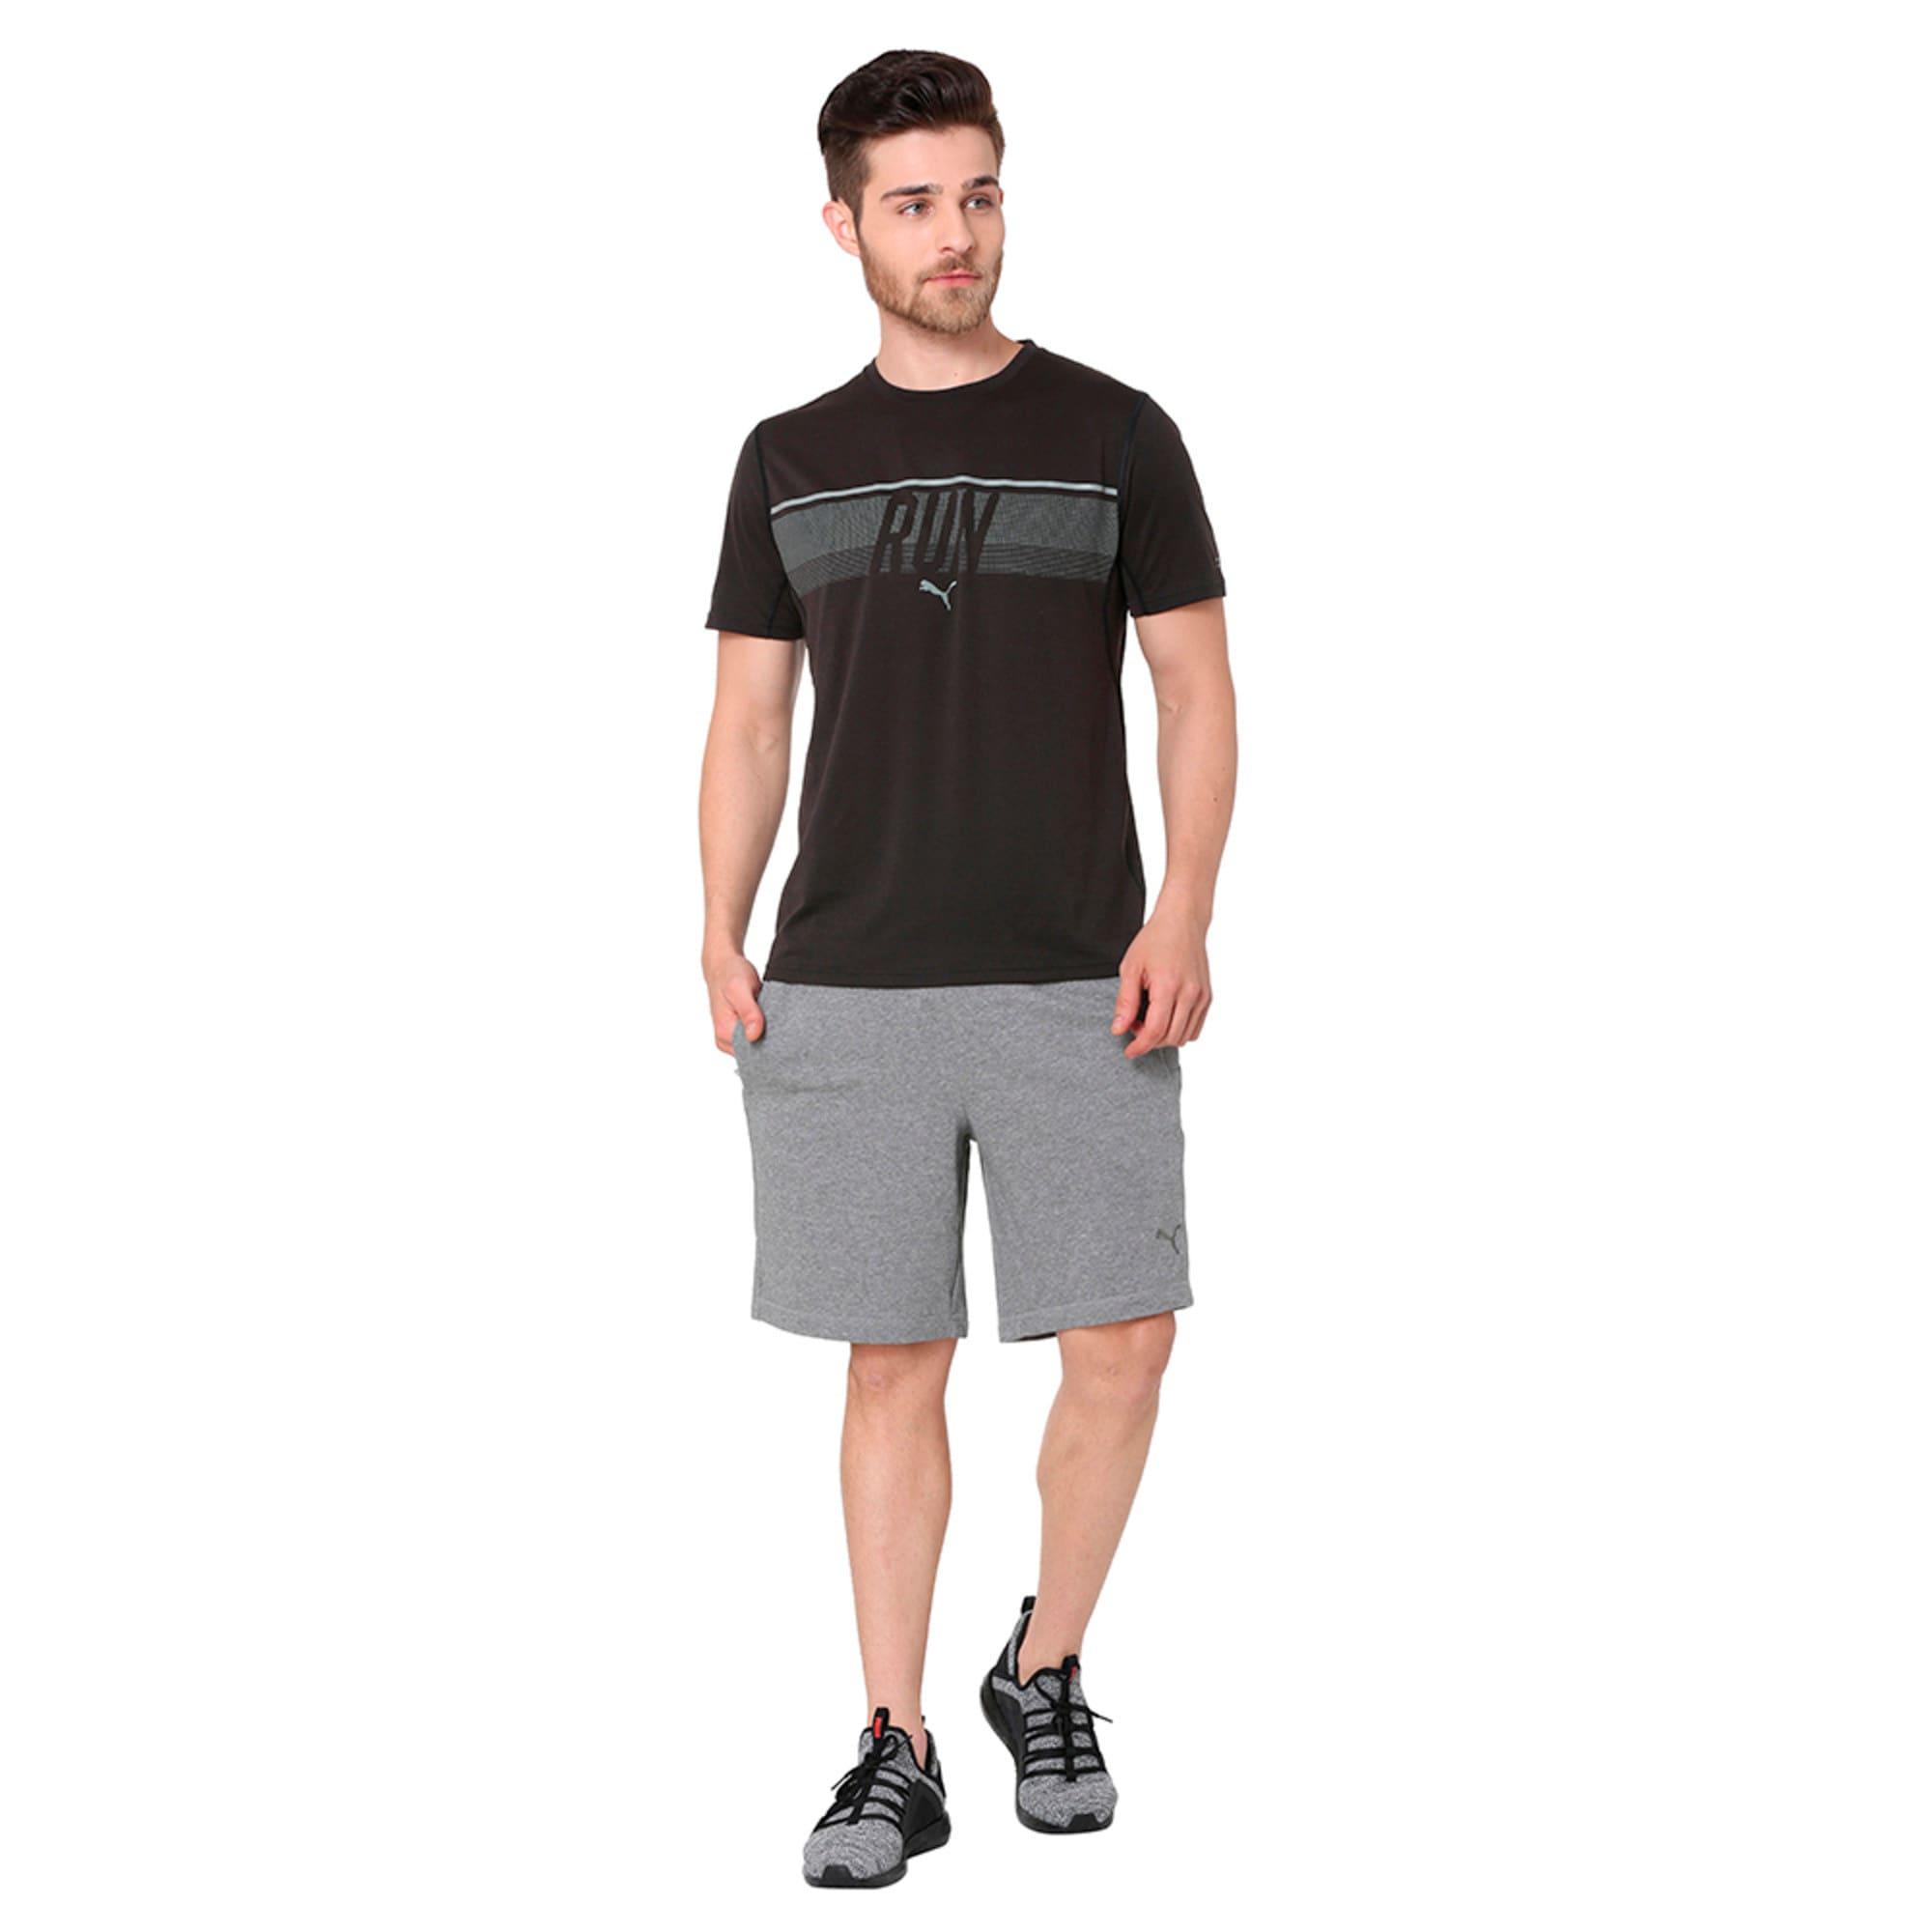 Thumbnail 3 of Run Men's Running T-Shirt, Puma Black, medium-IND